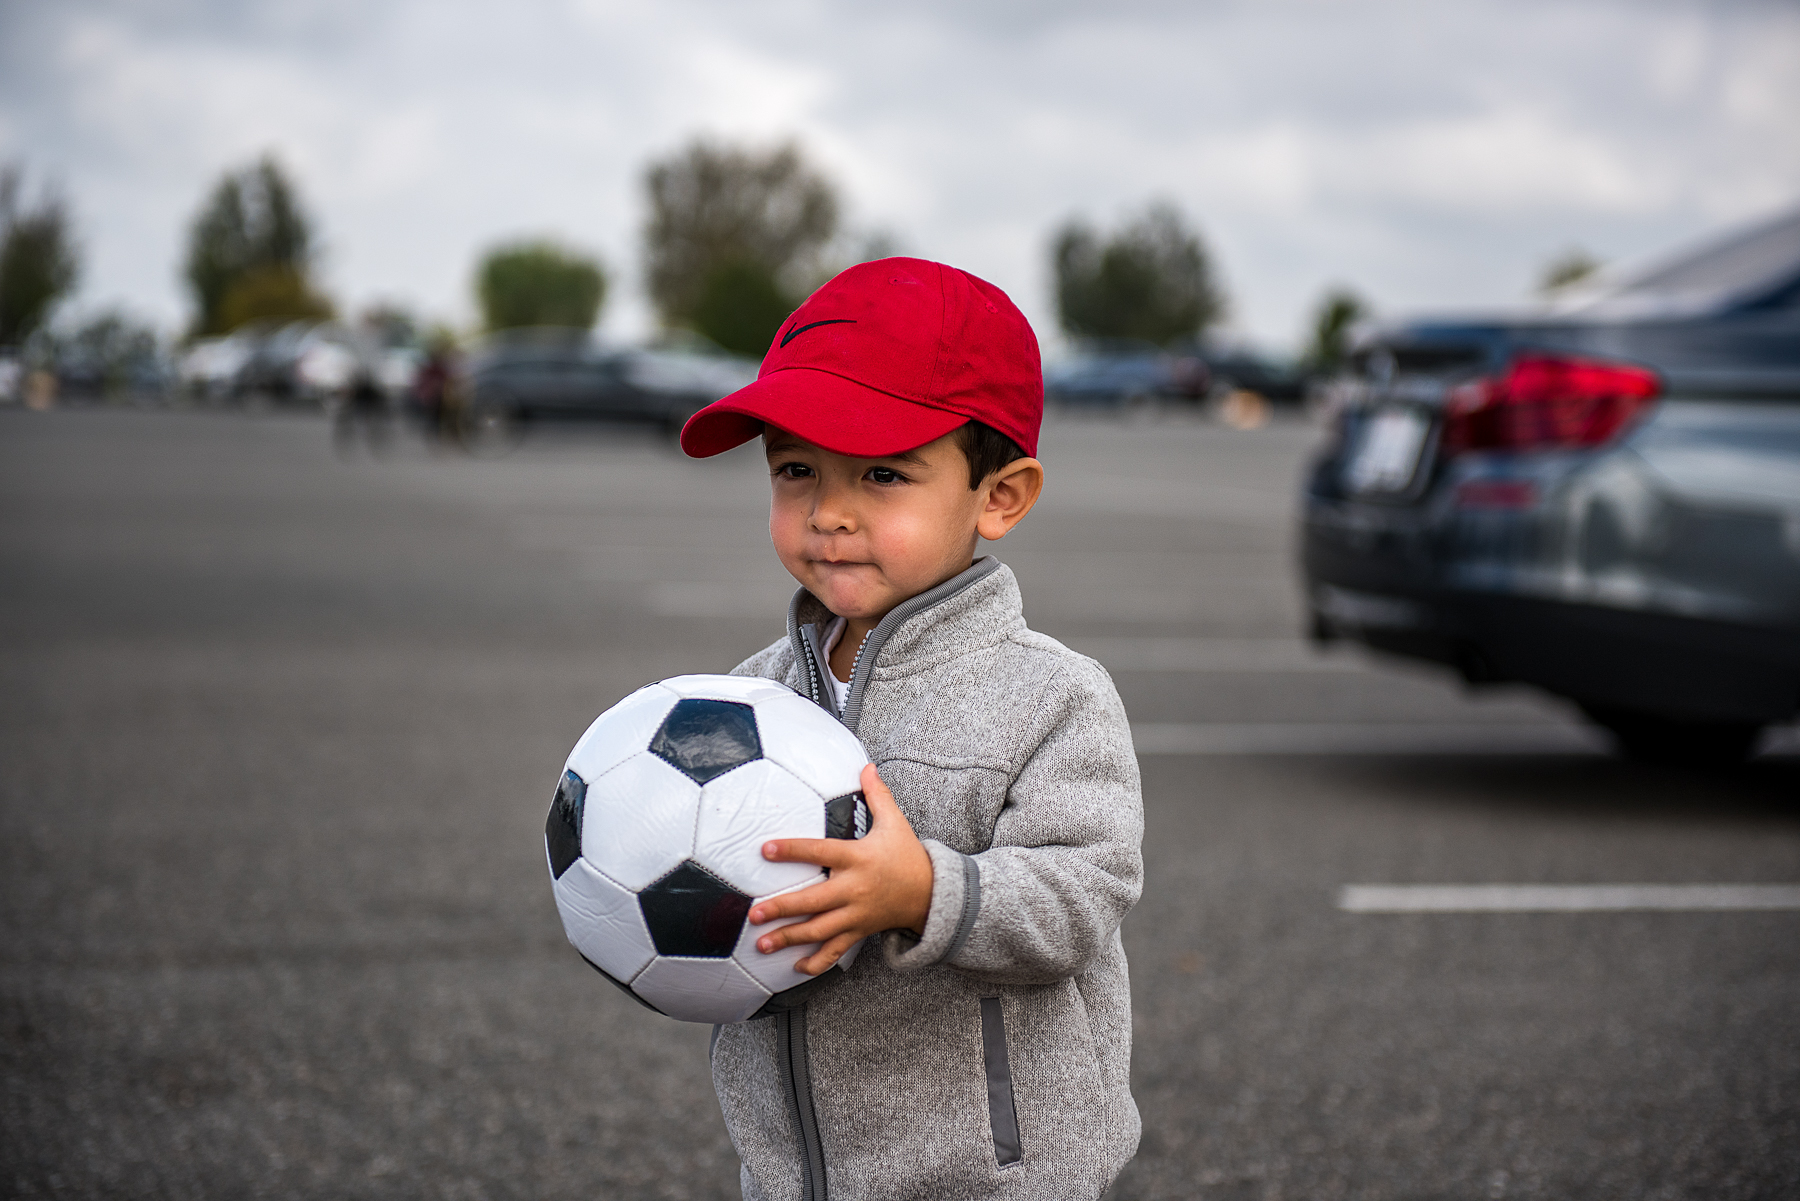 Caleb Soccer